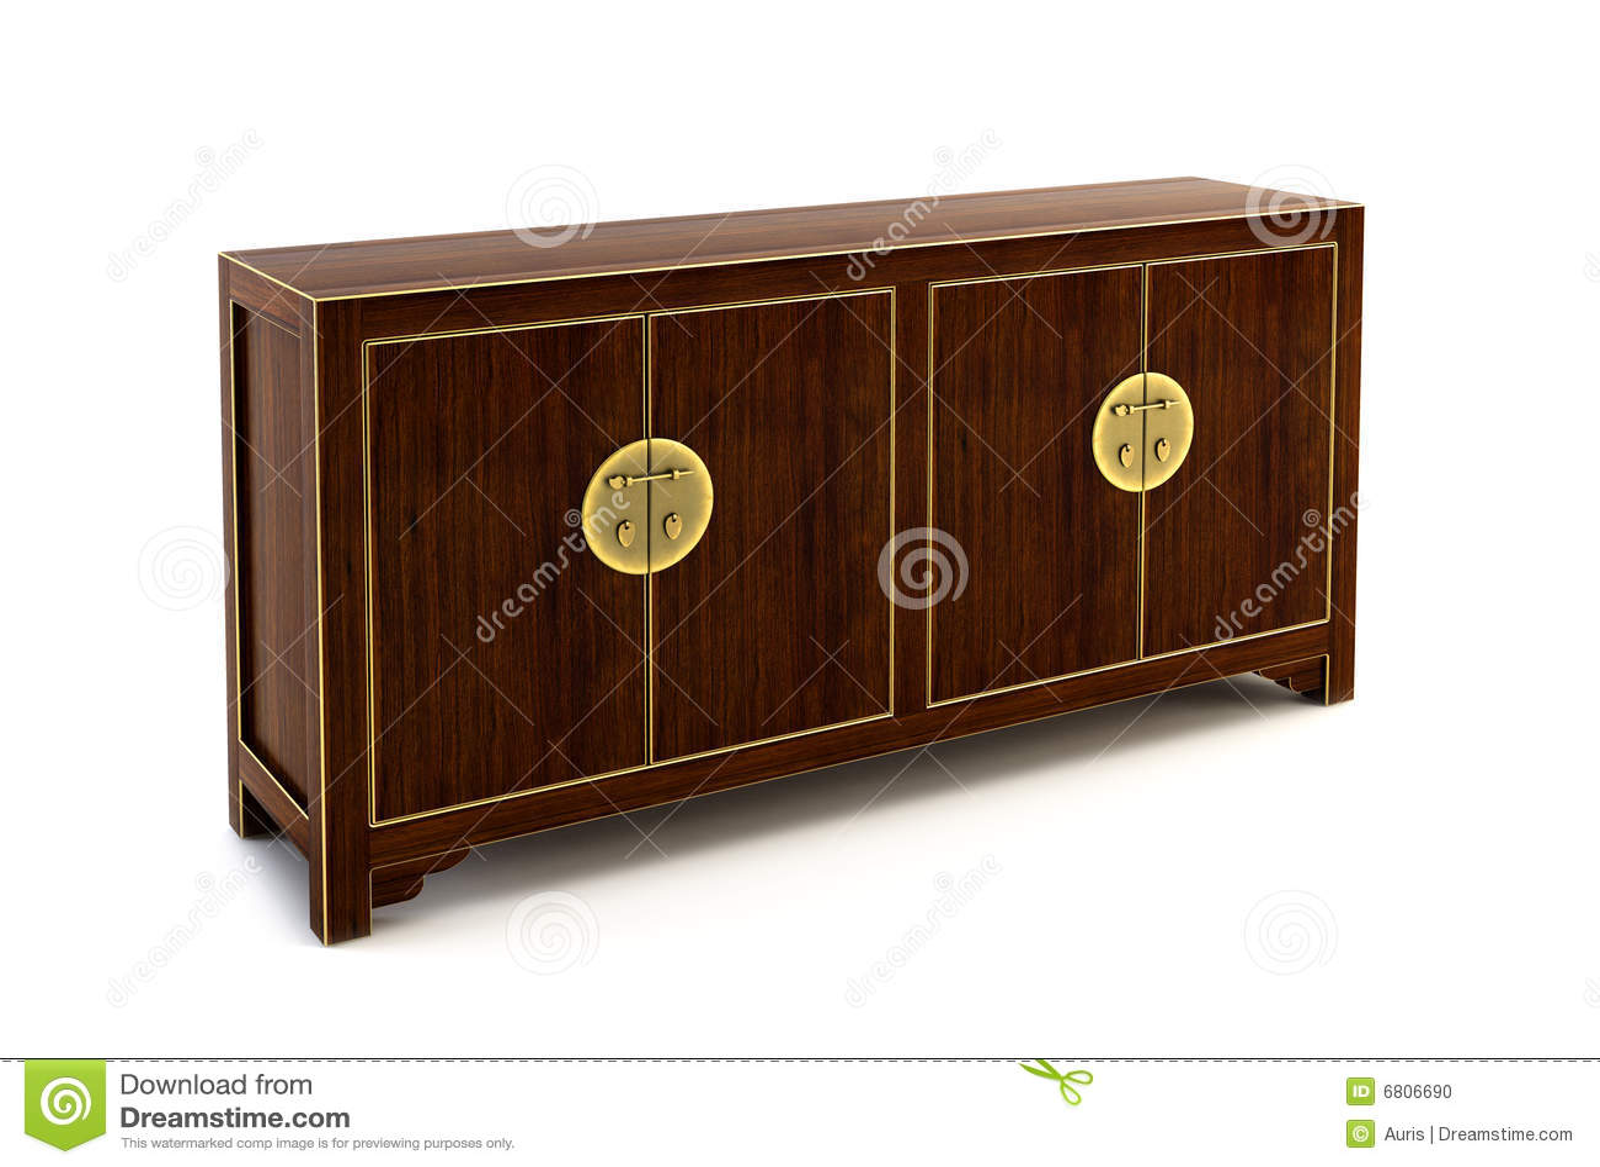 bureau 3d rendering stock photo image 6806690. Black Bedroom Furniture Sets. Home Design Ideas